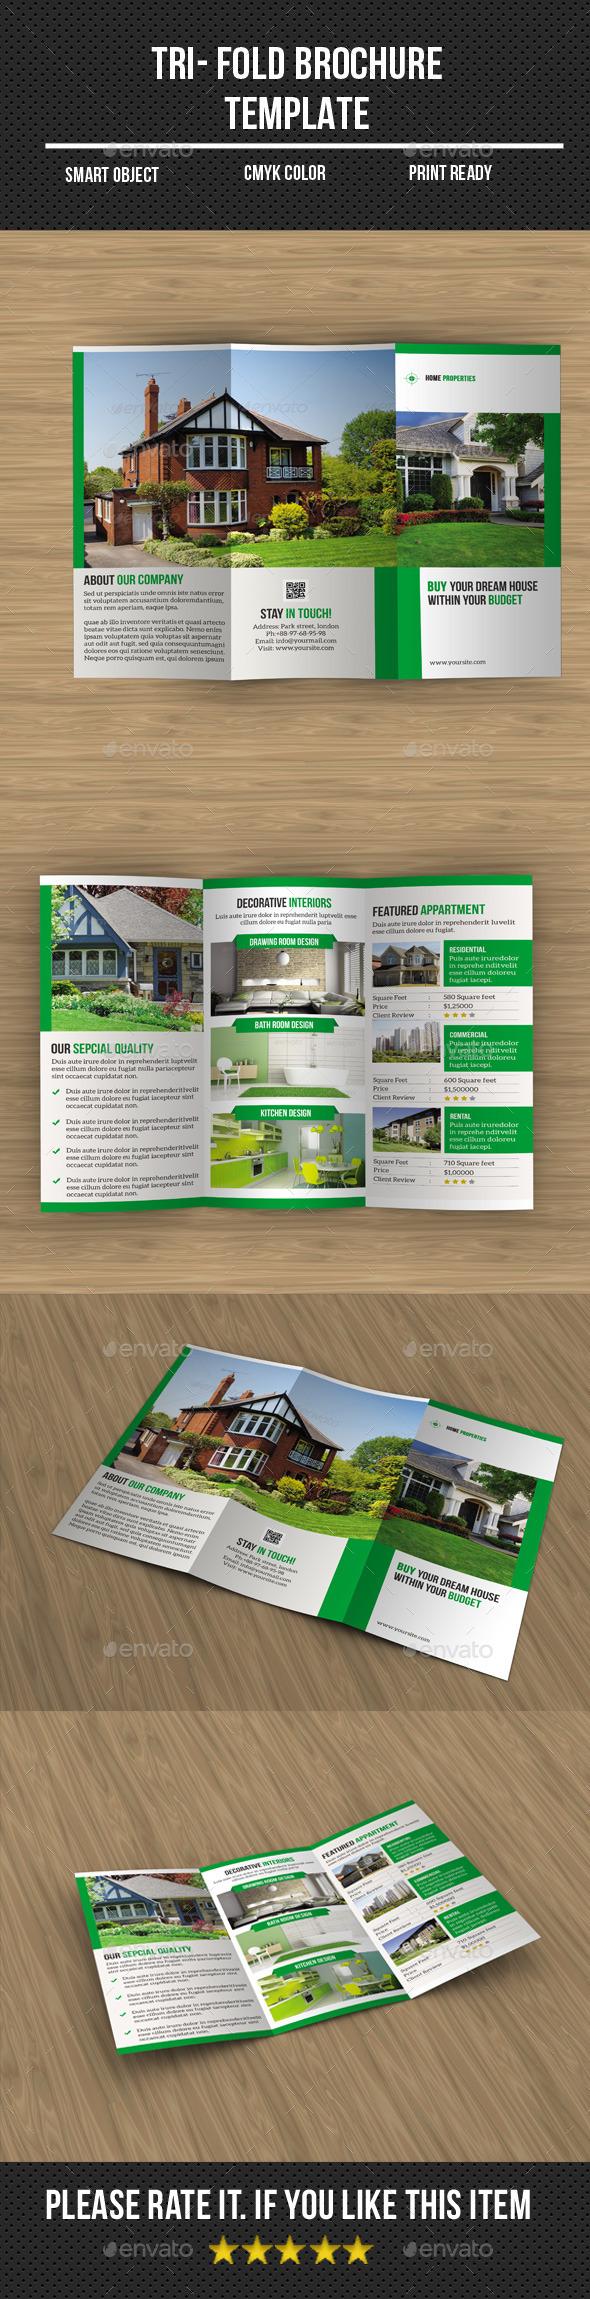 Real Estate Tri- Fold Brochure - Corporate Brochures